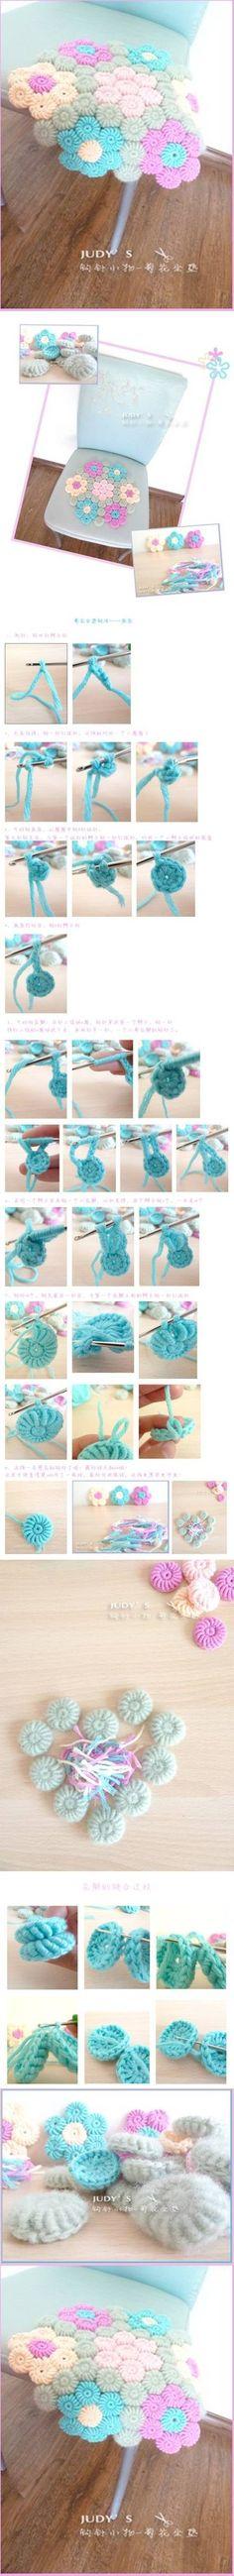 DIY Flower Hook Rug DIY Flower Hook Rug by diyforever